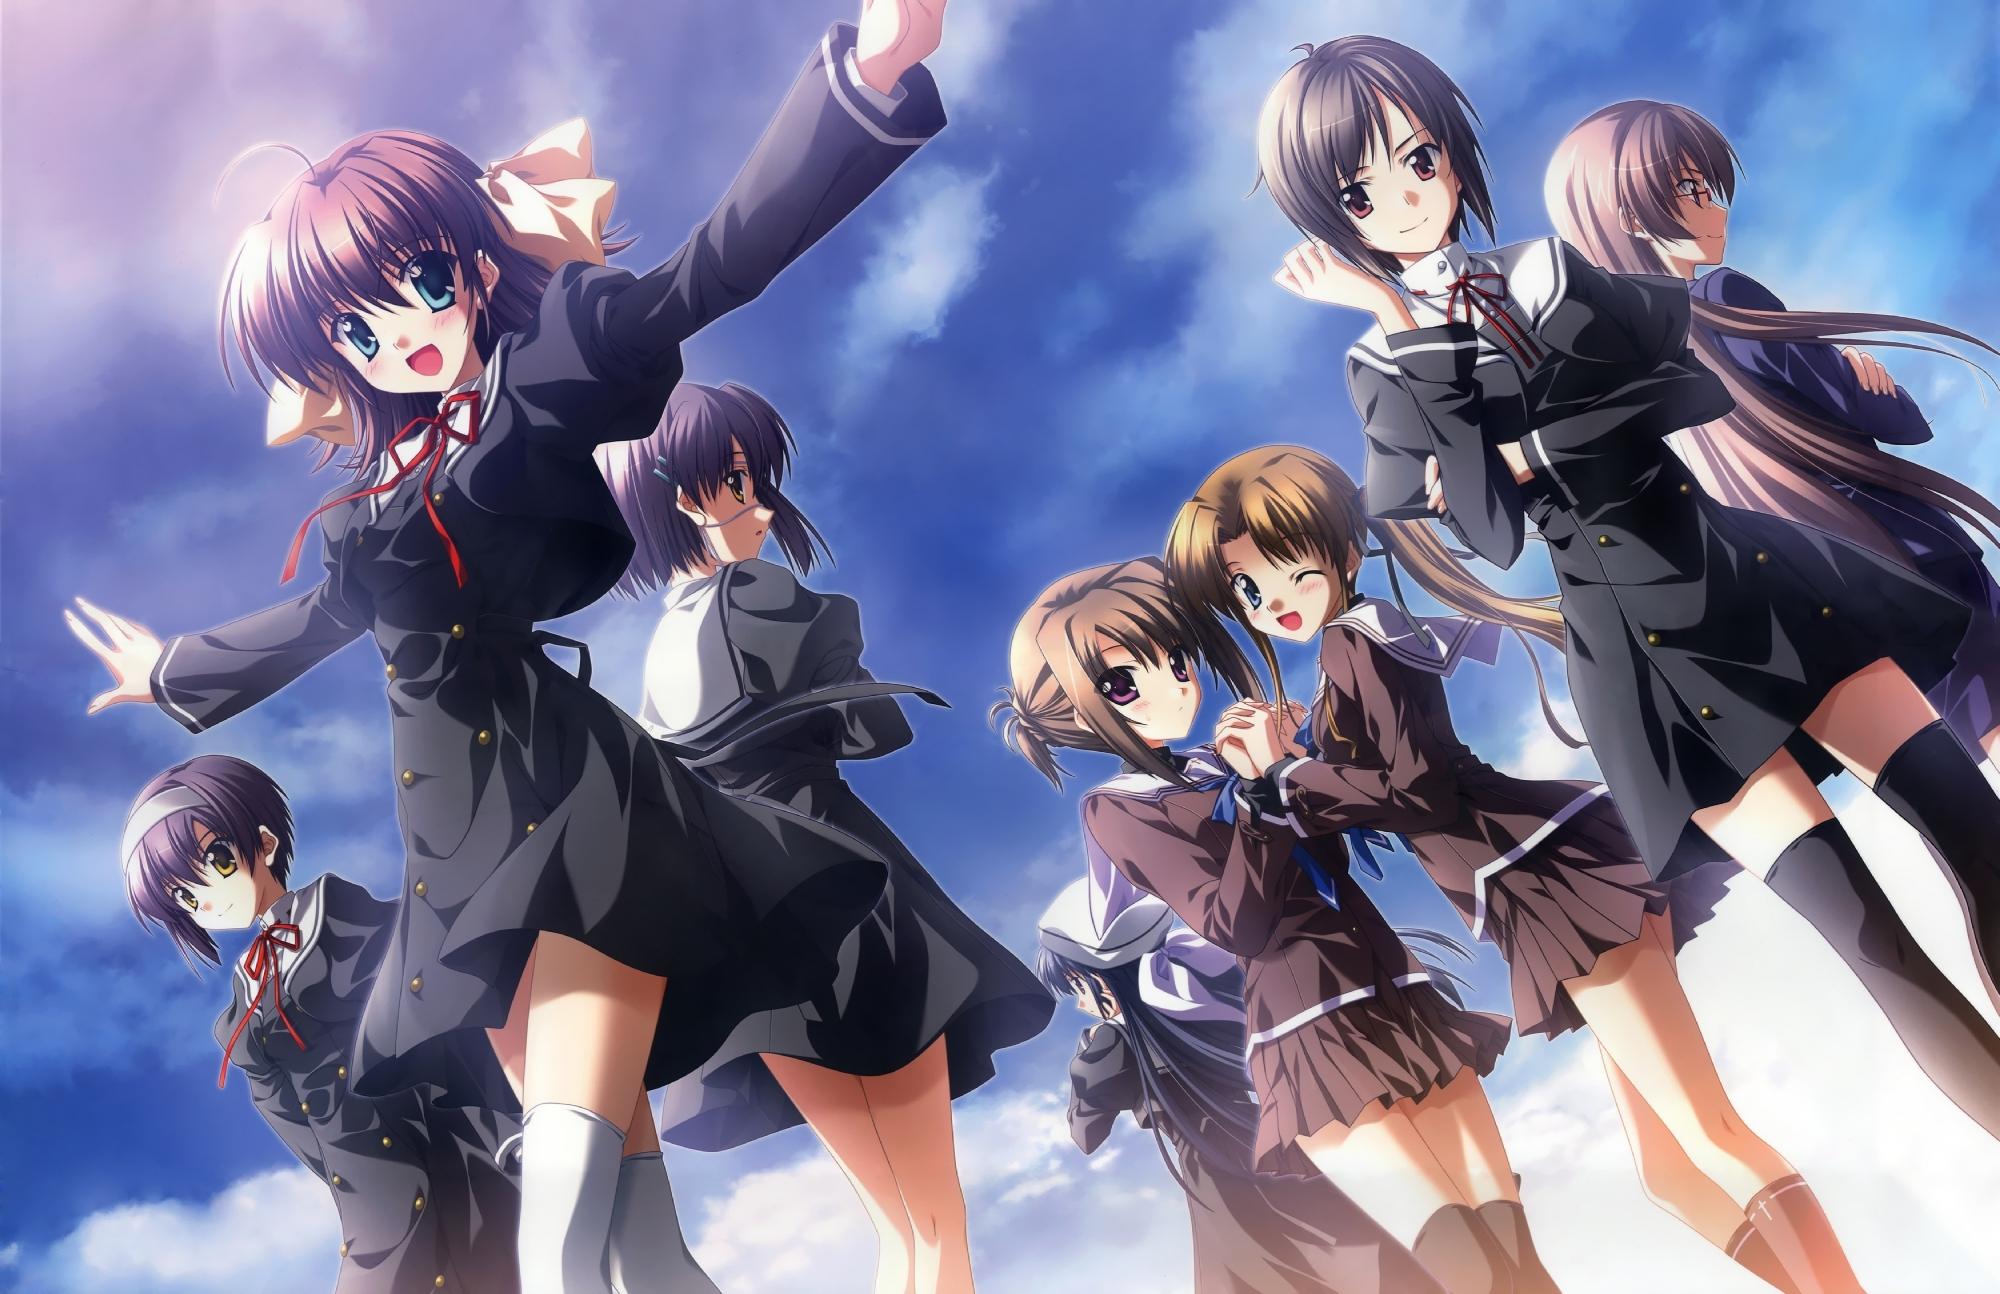 De quel anime s'agit-il ?  Ef_tale_of_memories_anime_girls_desktop_2000x1294_hd-wallpaper-751551